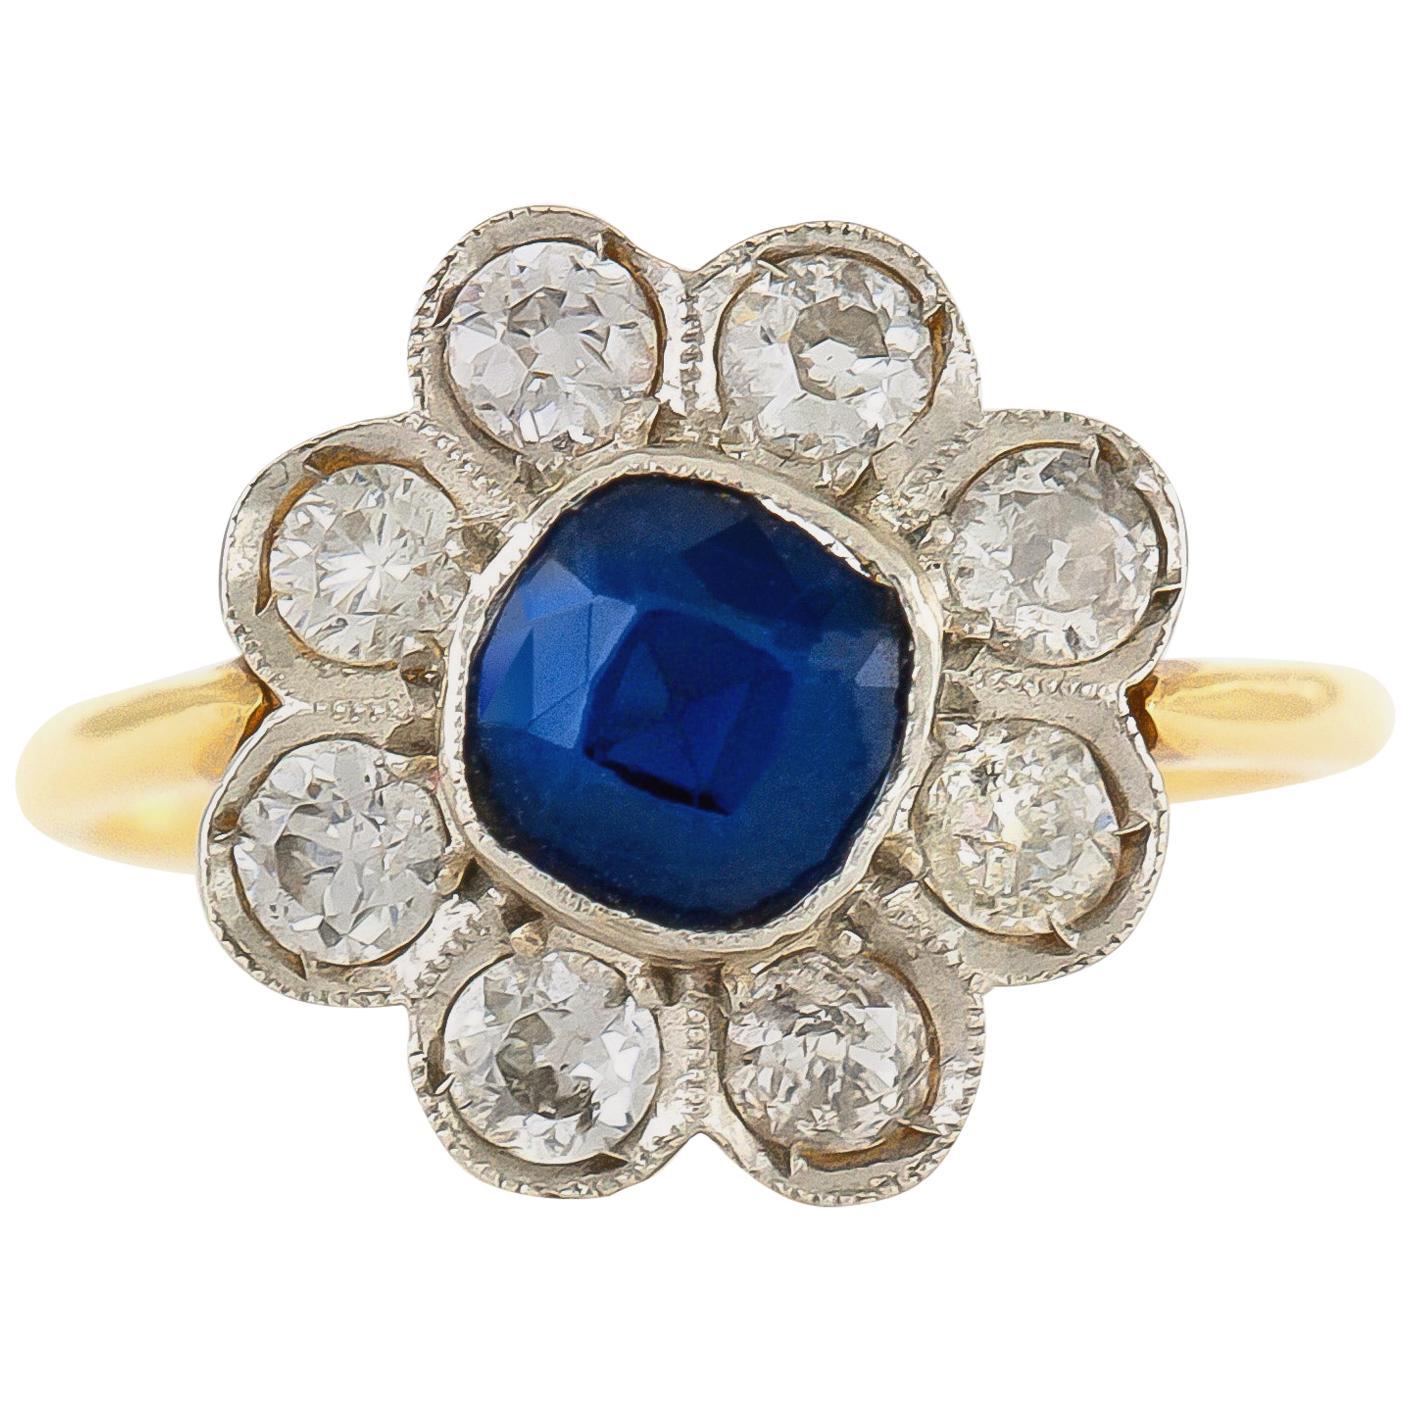 18 Karat and Platinum Flower with Sapphire and Diamonds Ring